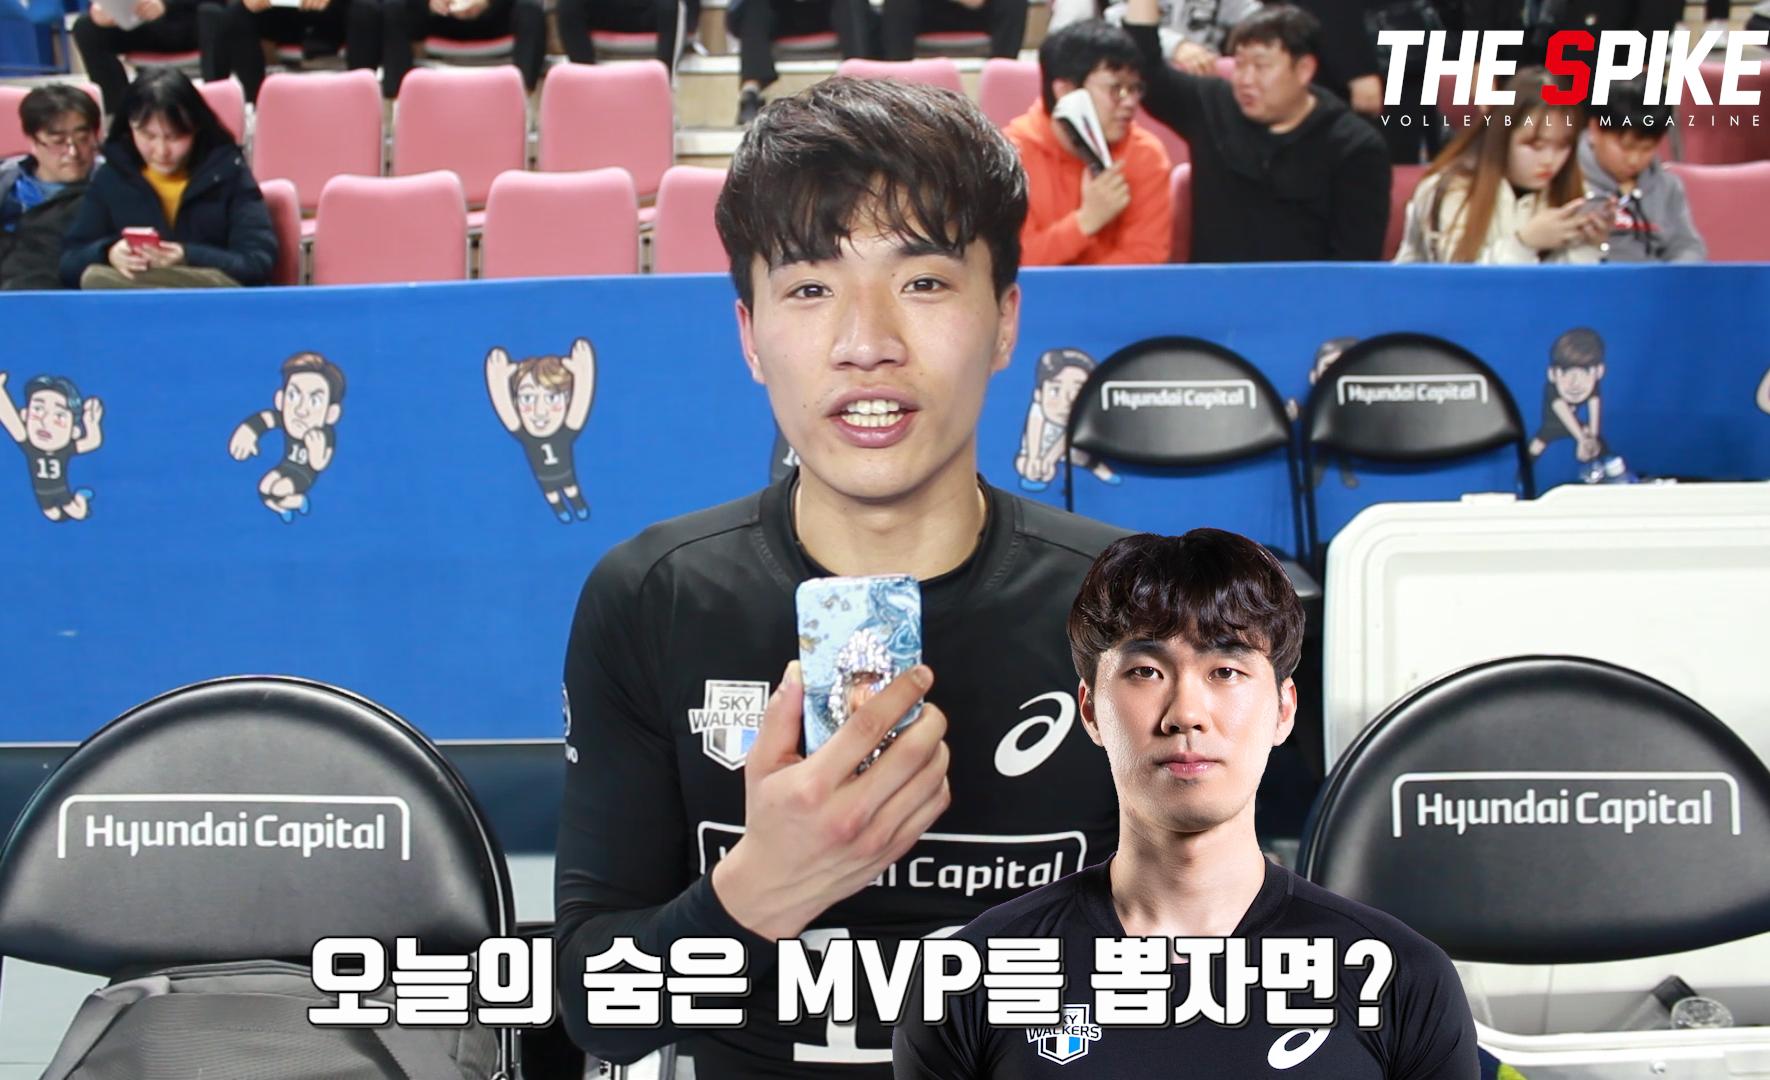 [SpikeTV] '오늘의 숨은 MVP는?' 현대캐피탈 릴레이 인터뷰!